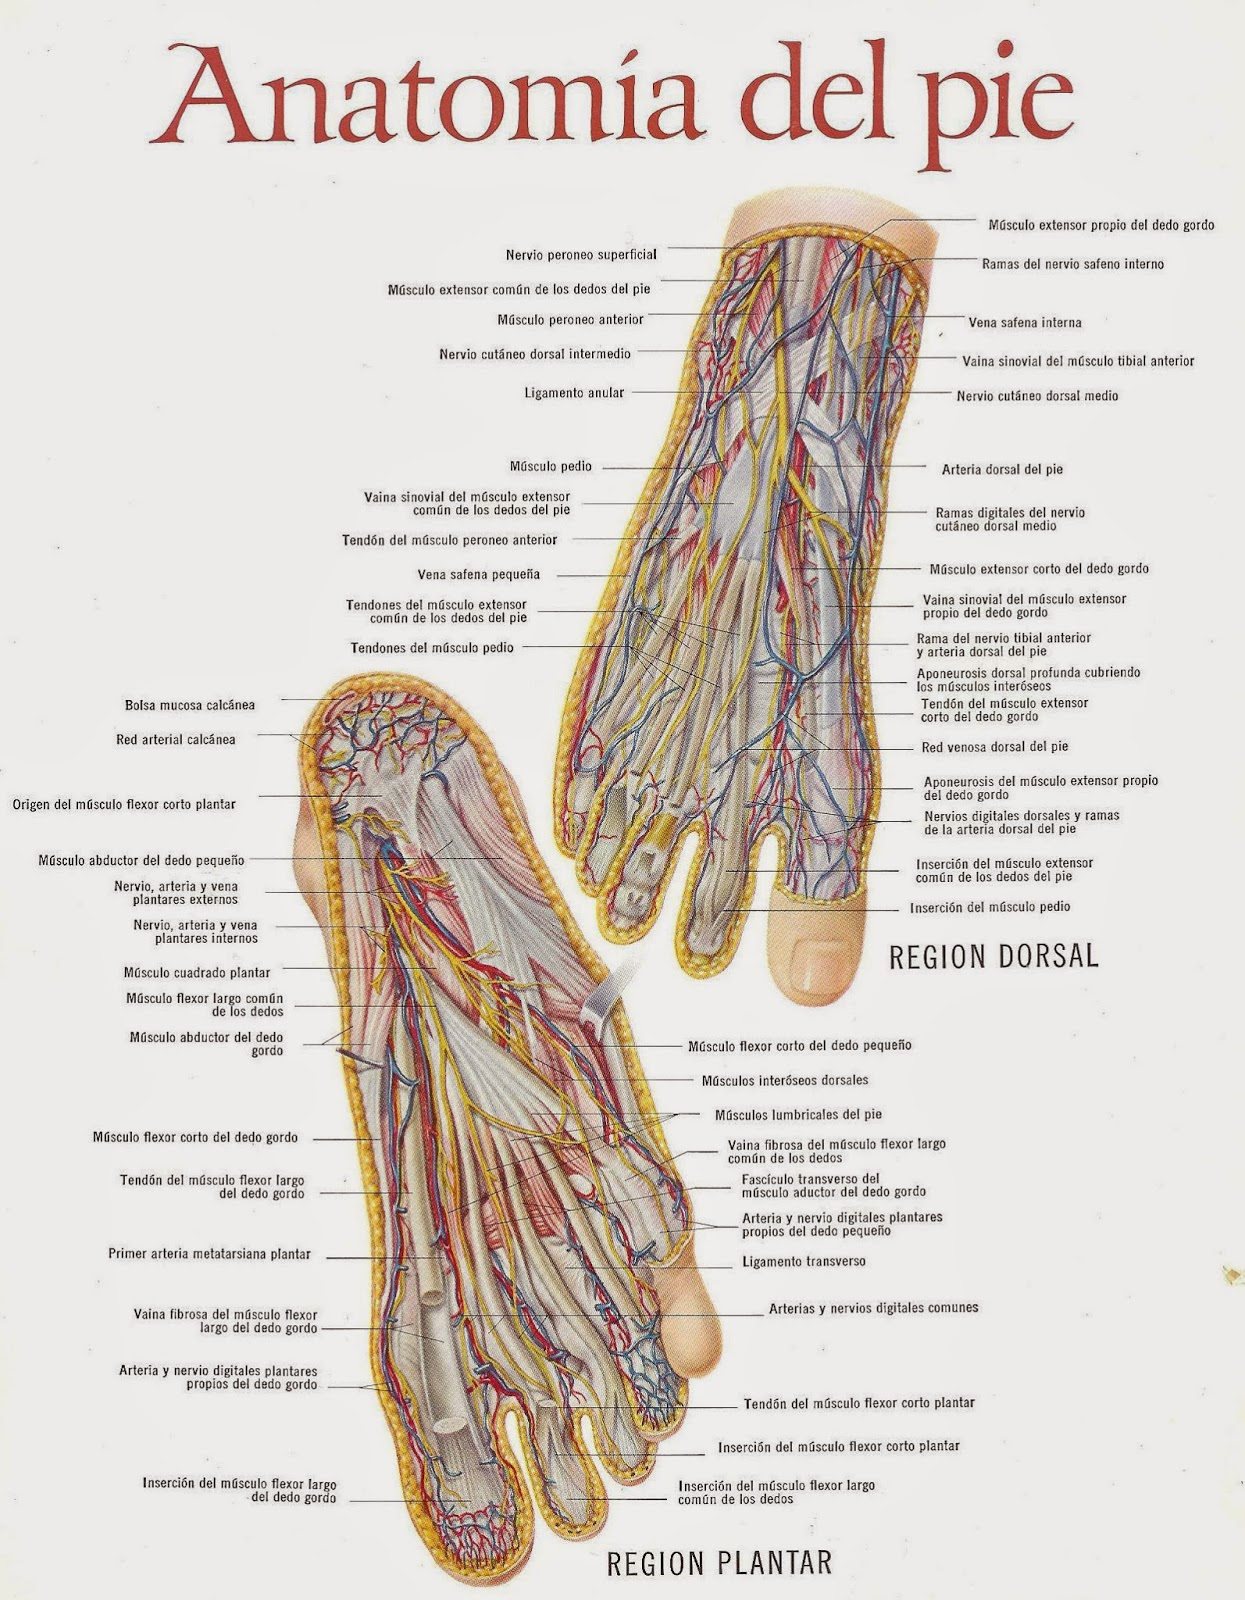 Anatomia Del Pie Derecho | www.imagenesmy.com